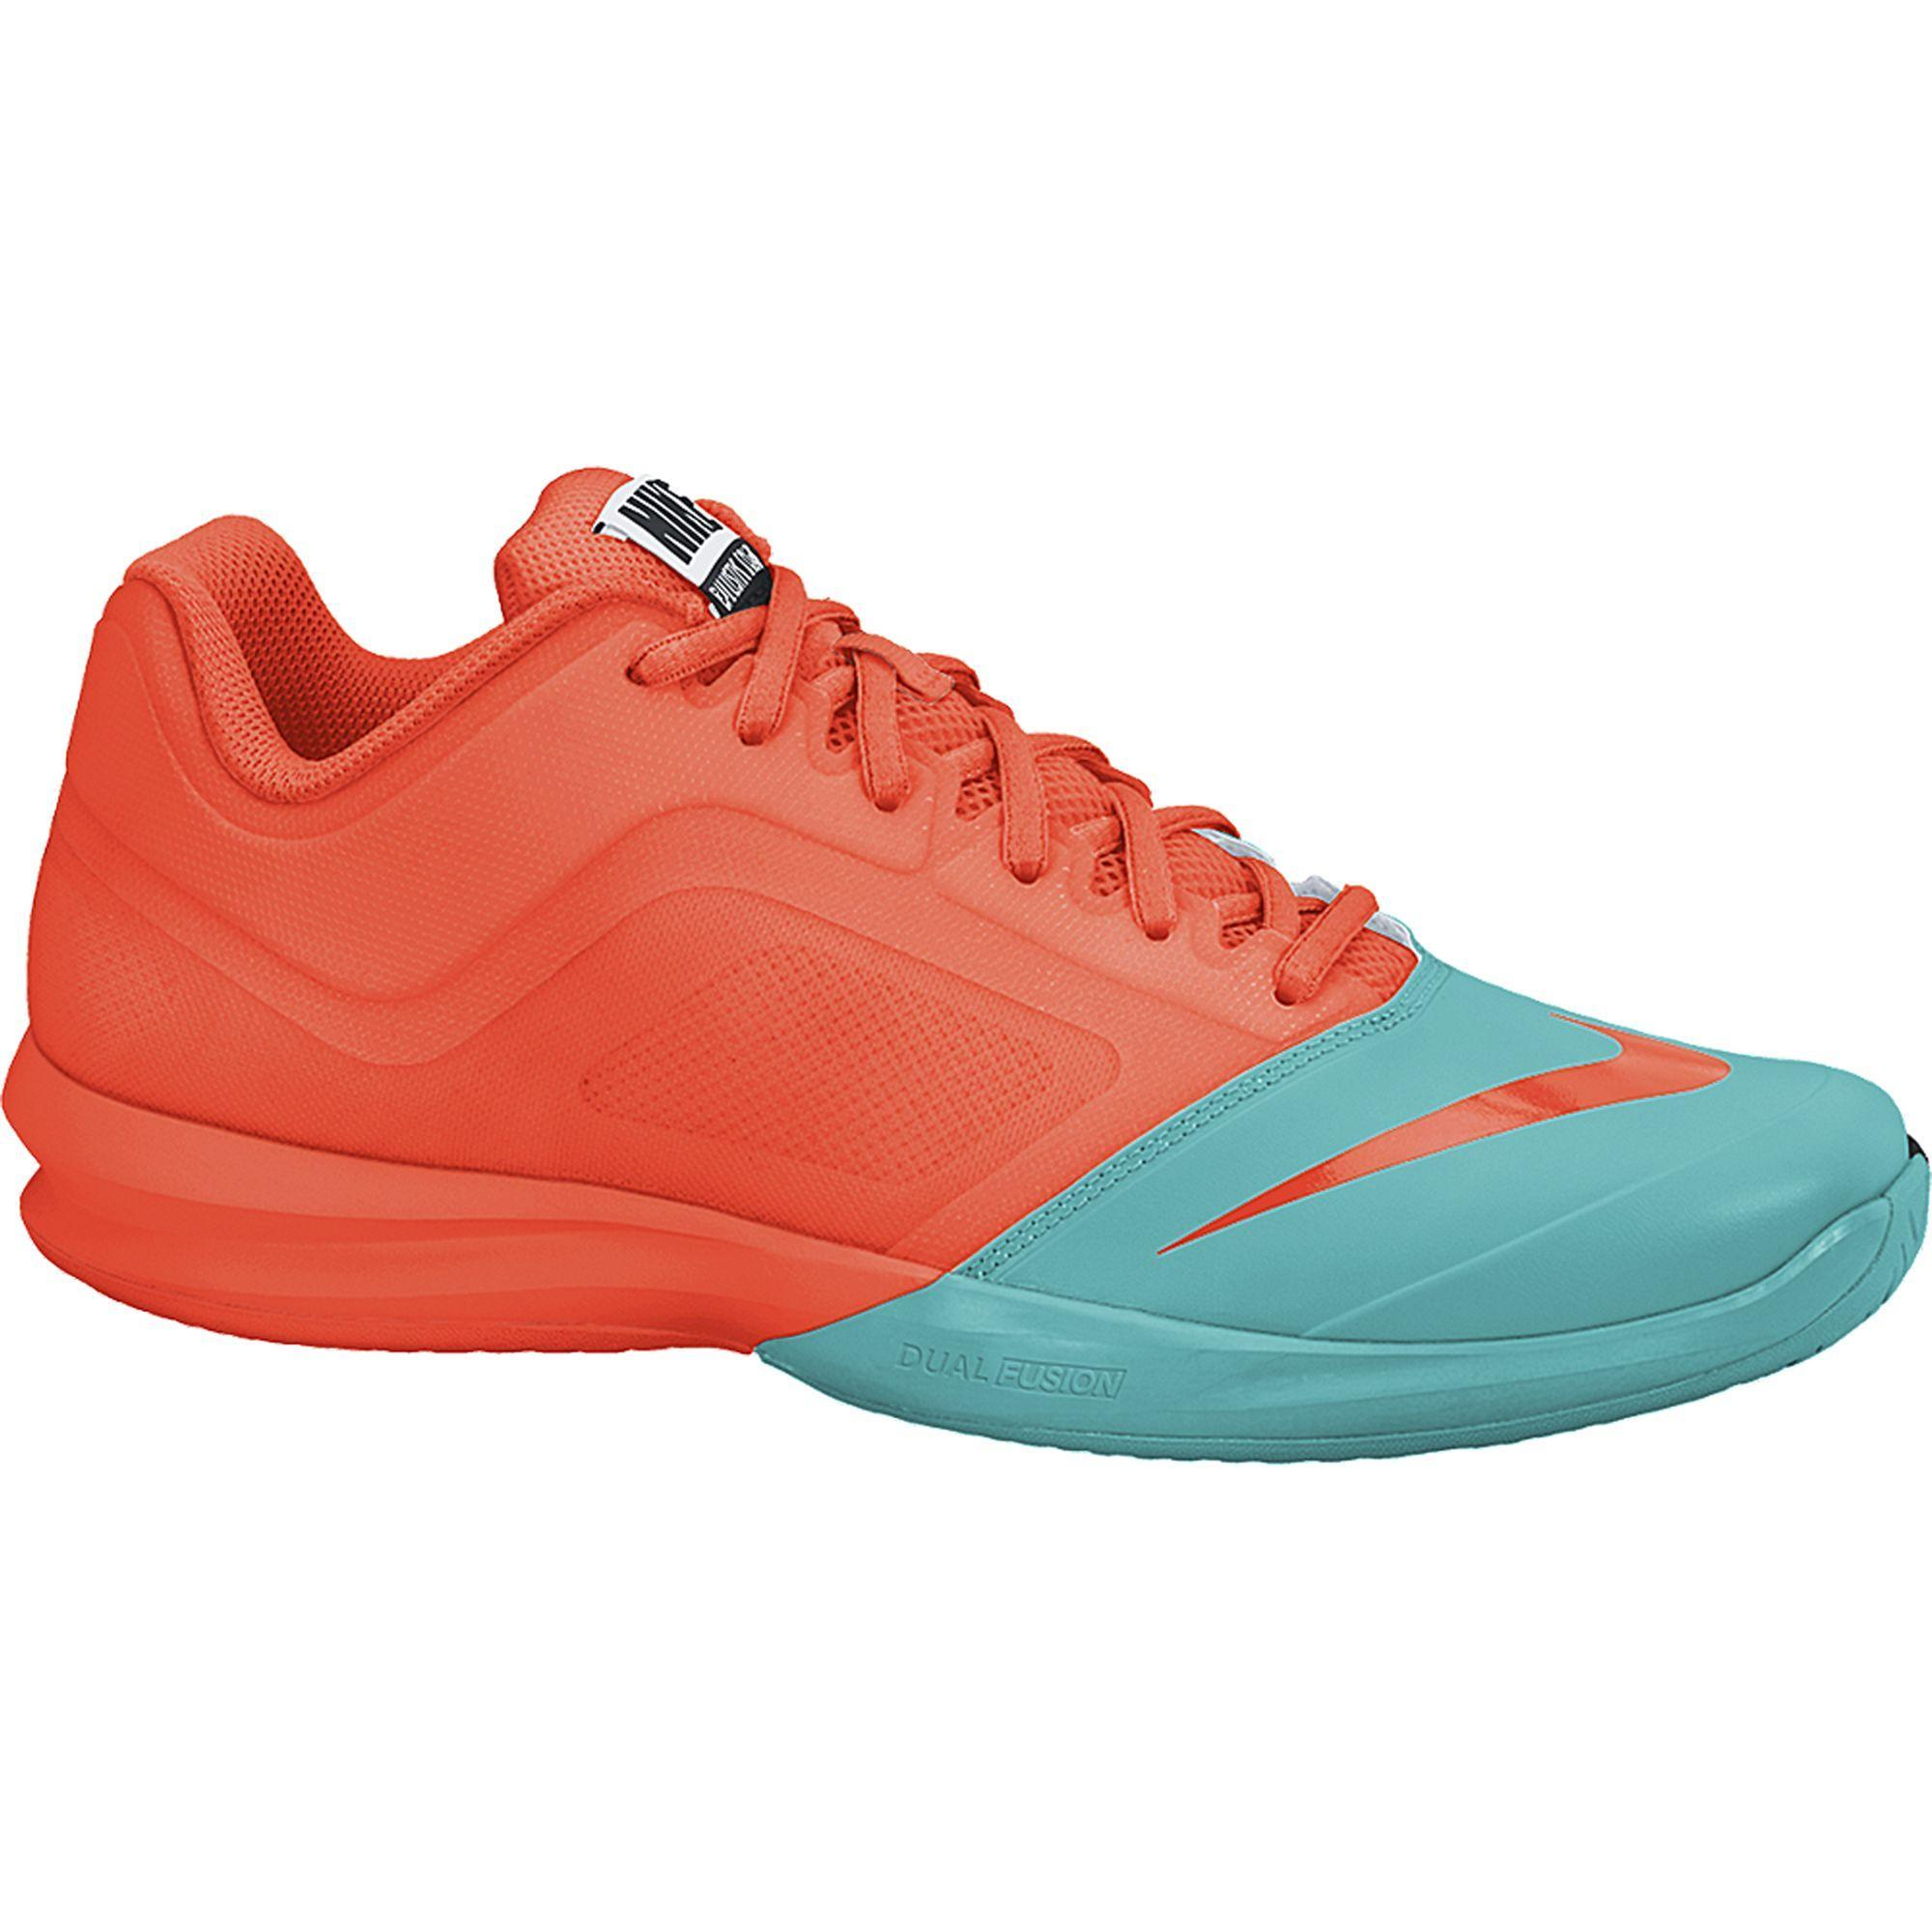 Nike Mens Dual Fusion Ballistec Advantage Tennis Shoes - Hyper  Crimson Dusty Cactus - Tennisnuts.com 0879648a2f